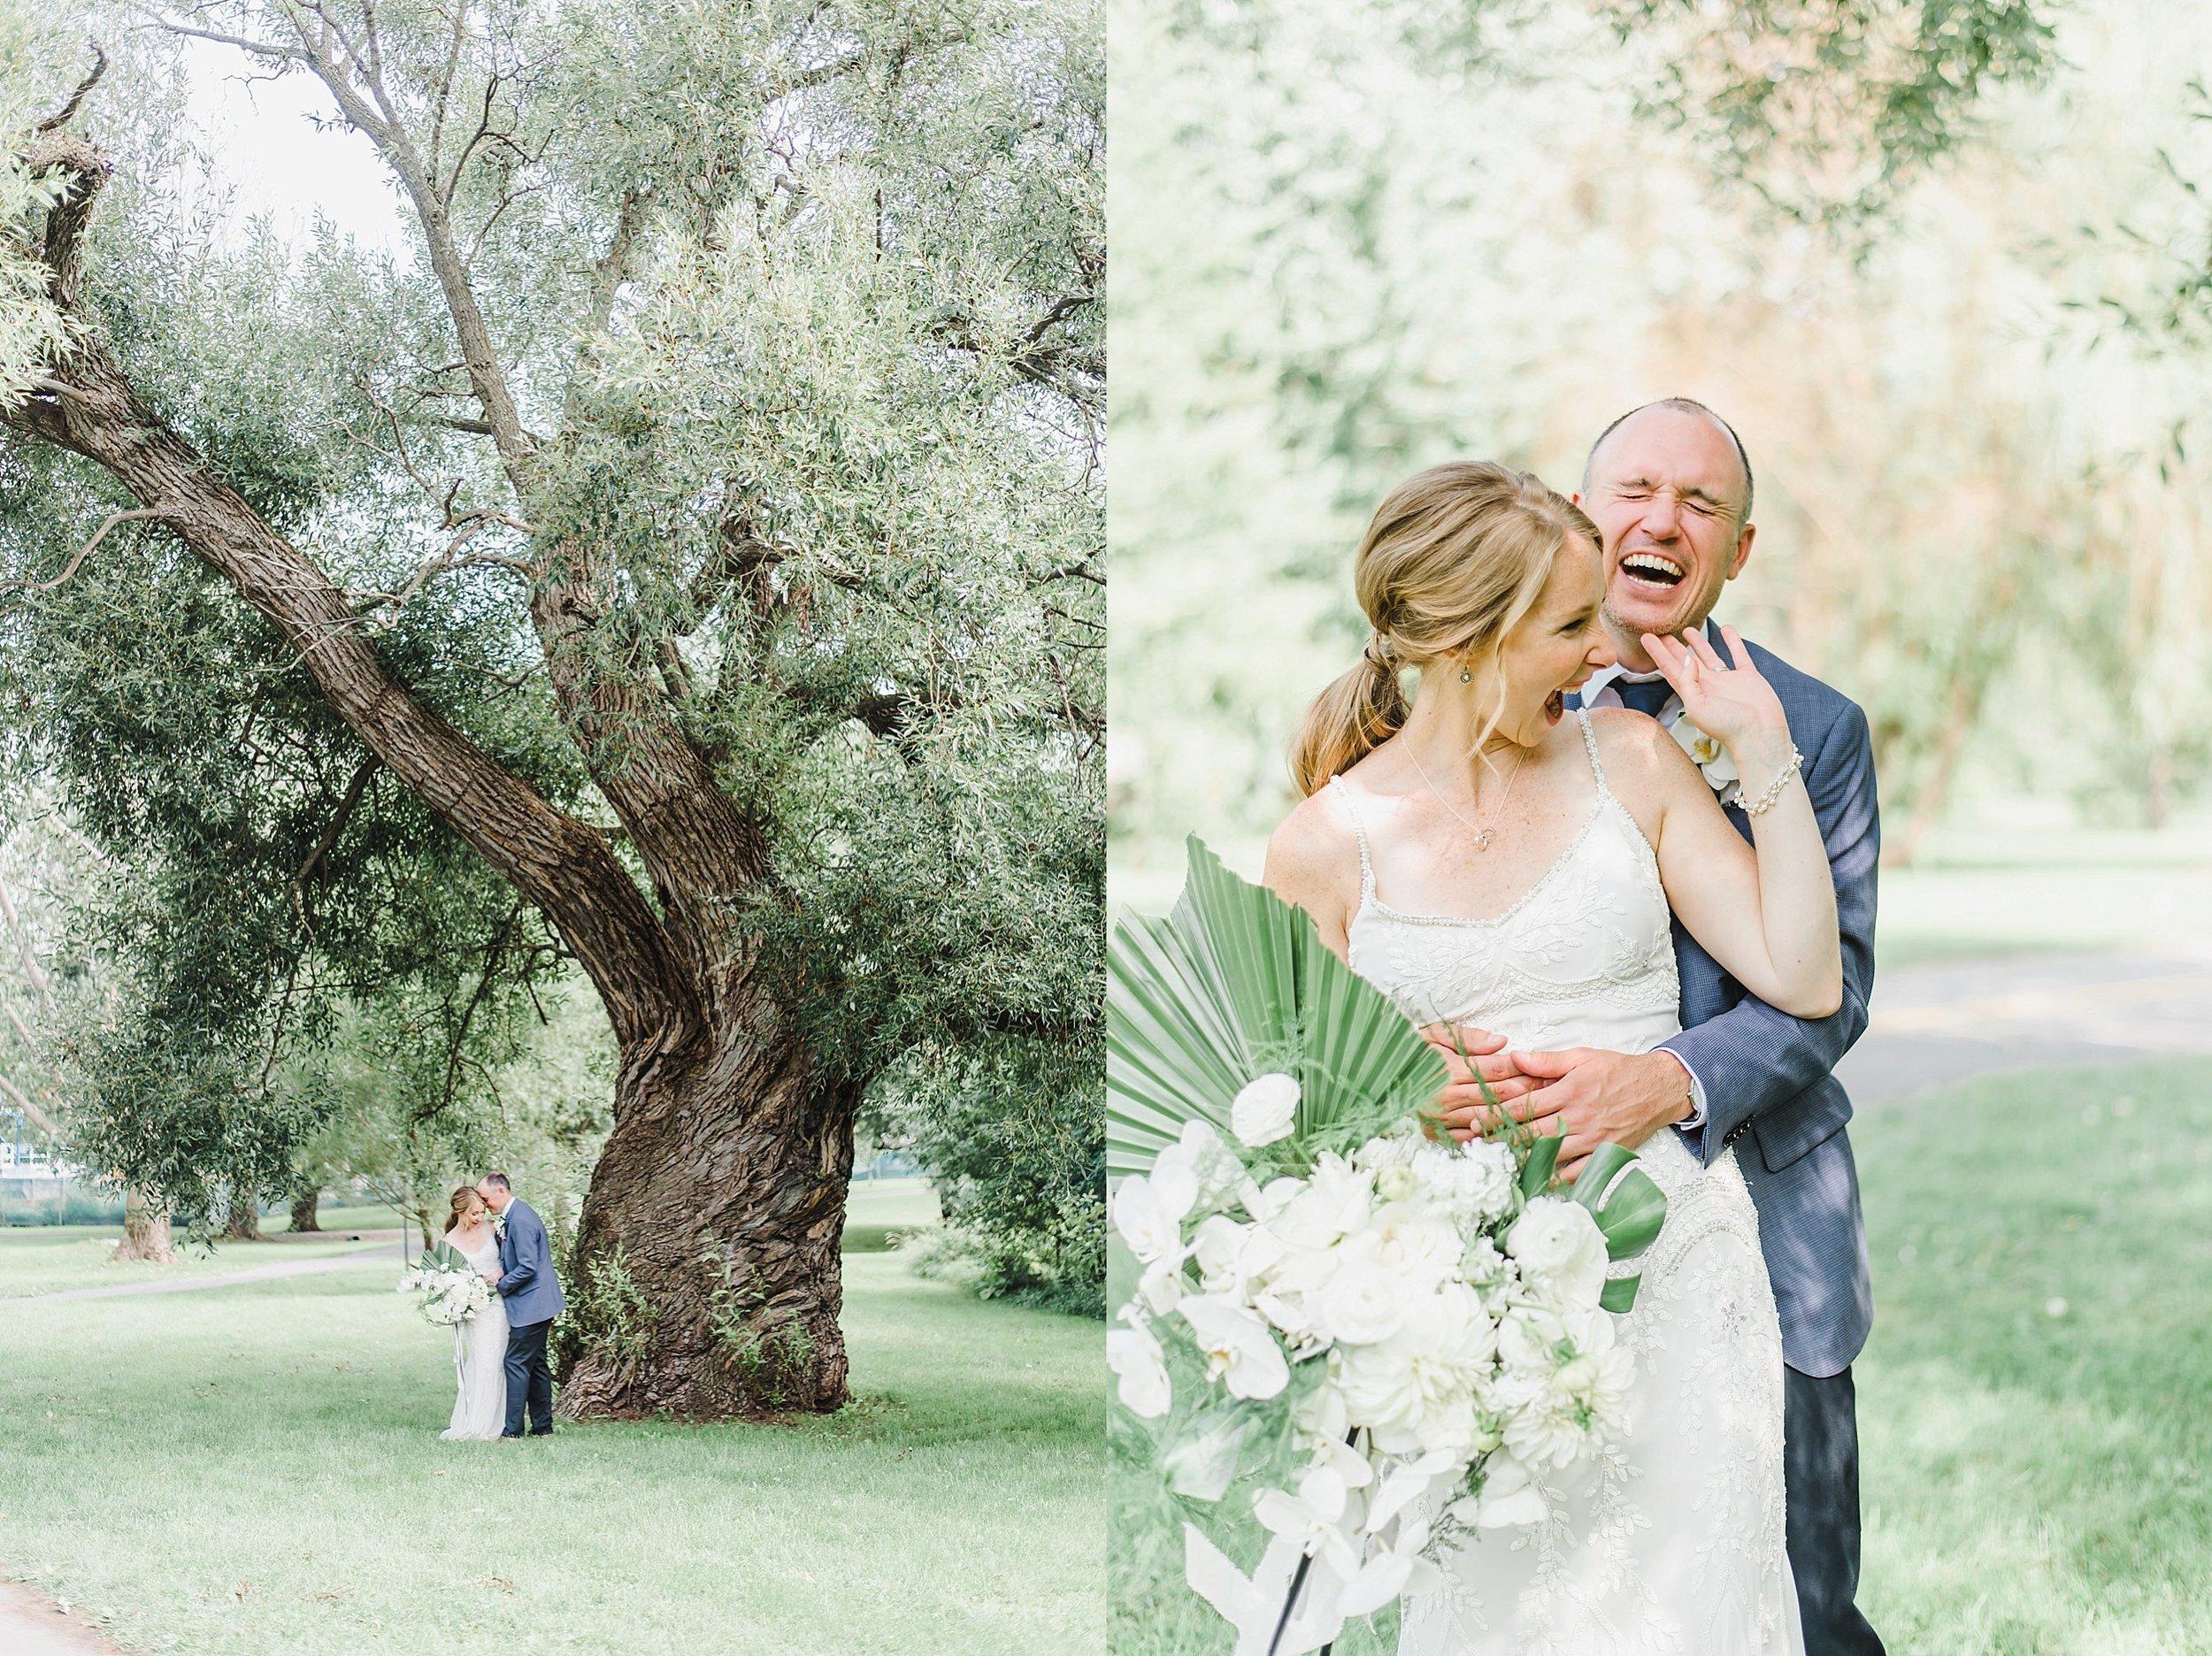 light airy indie fine art ottawa wedding photographer | Ali and Batoul Photography_0649.jpg